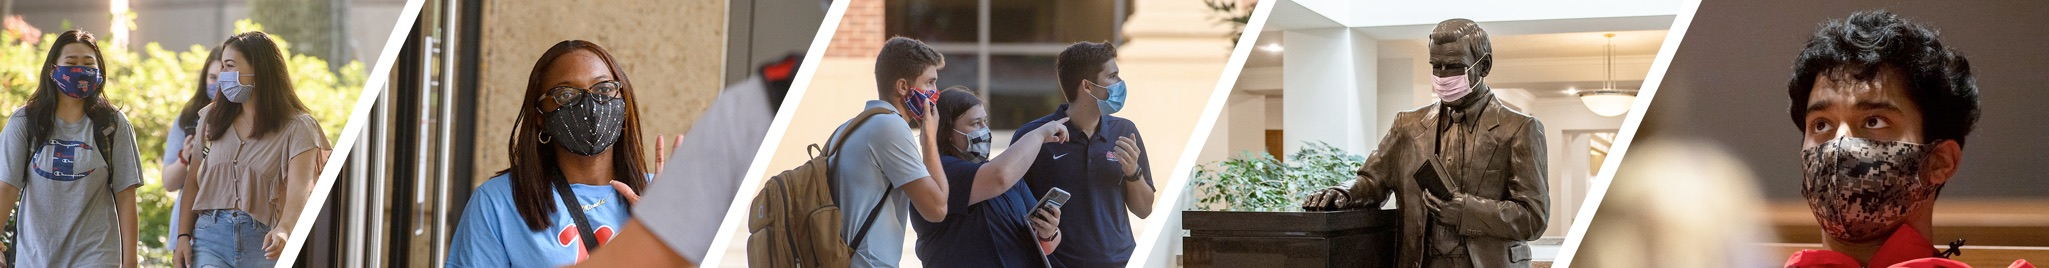 Various UM students wearing masks in academic settings